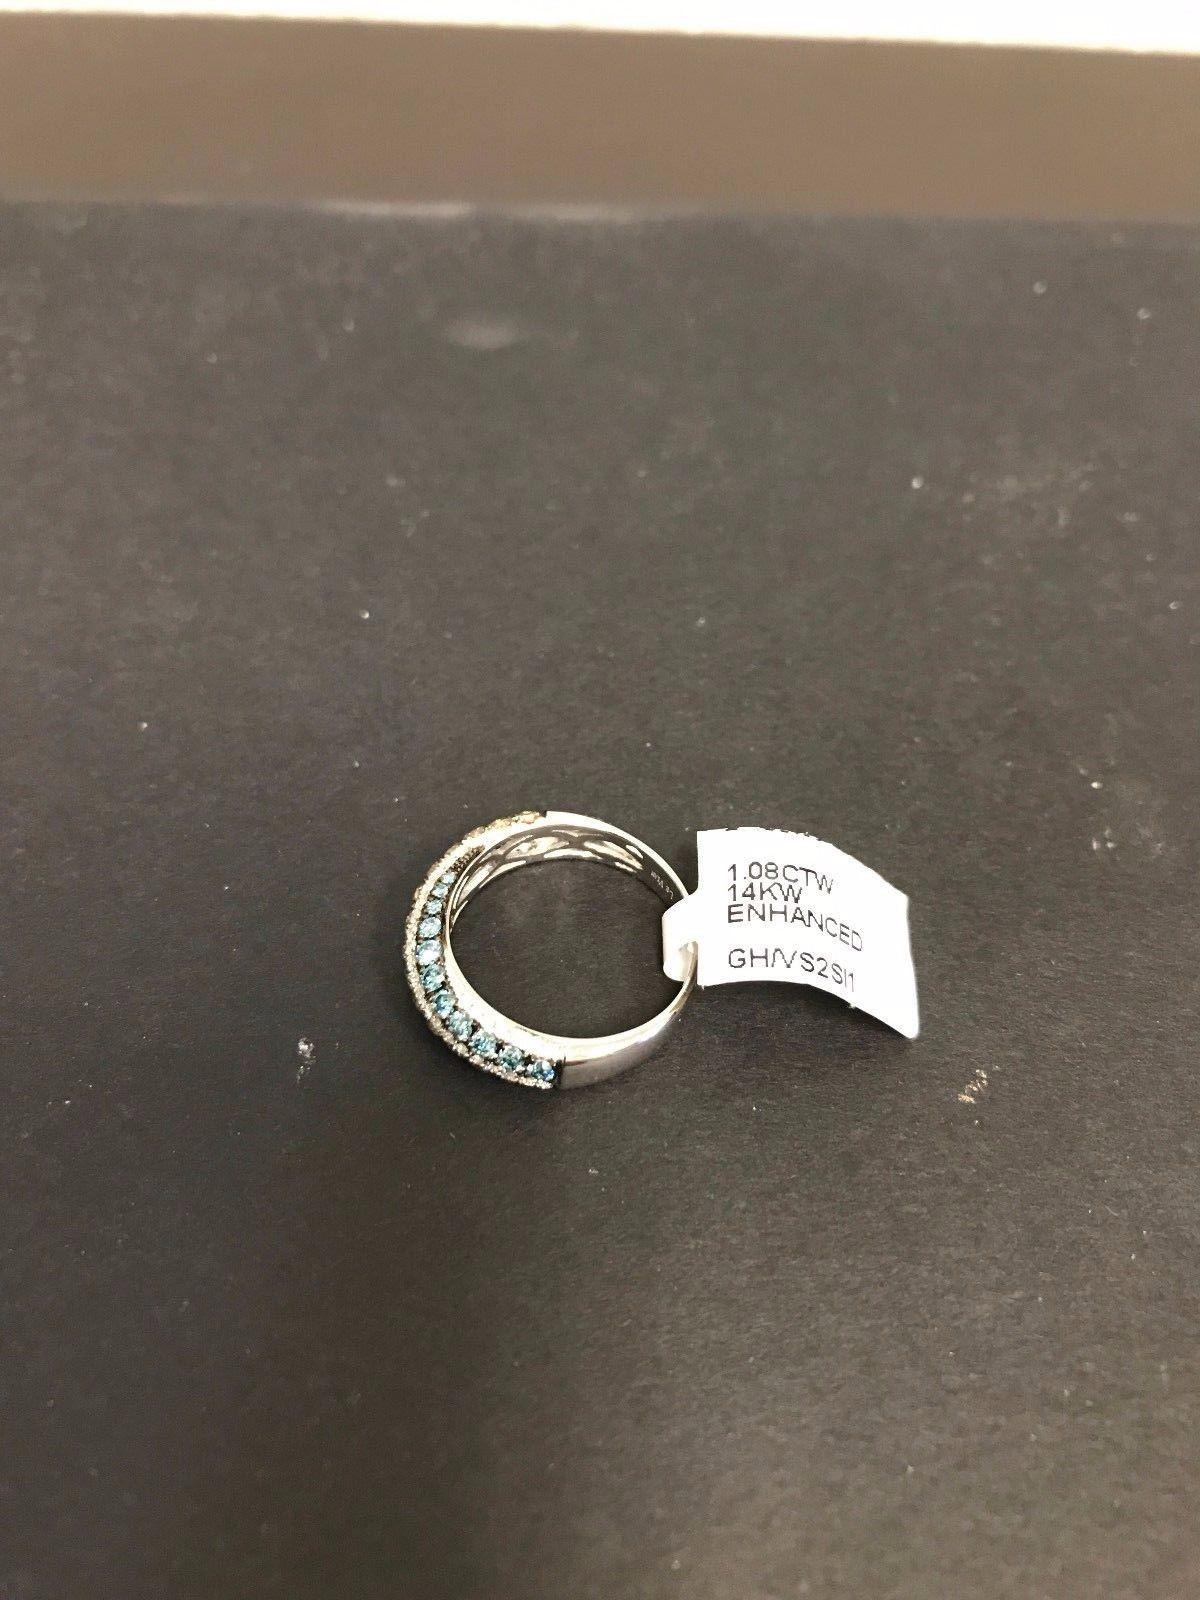 New Le Vian  ZUHQ 32 14kt  White Gold  Diamond Ring